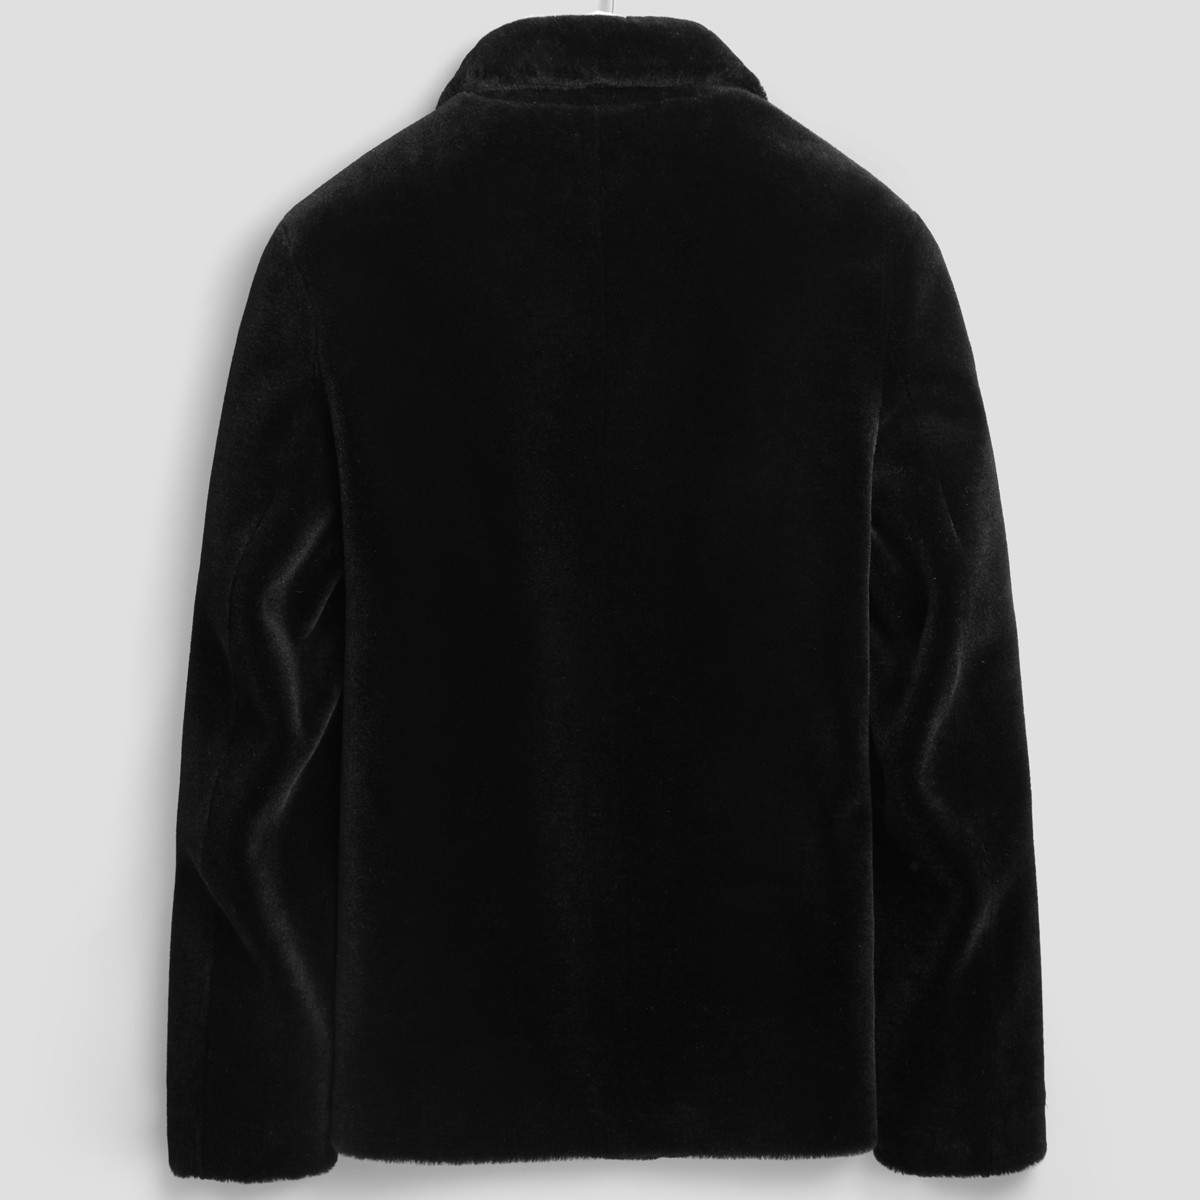 Real Sheep Shearling Fur Winter Jacket Men 100% Wool Coat Streetwear Mens Jackets And Coats Manteau LSY020183 MY1252